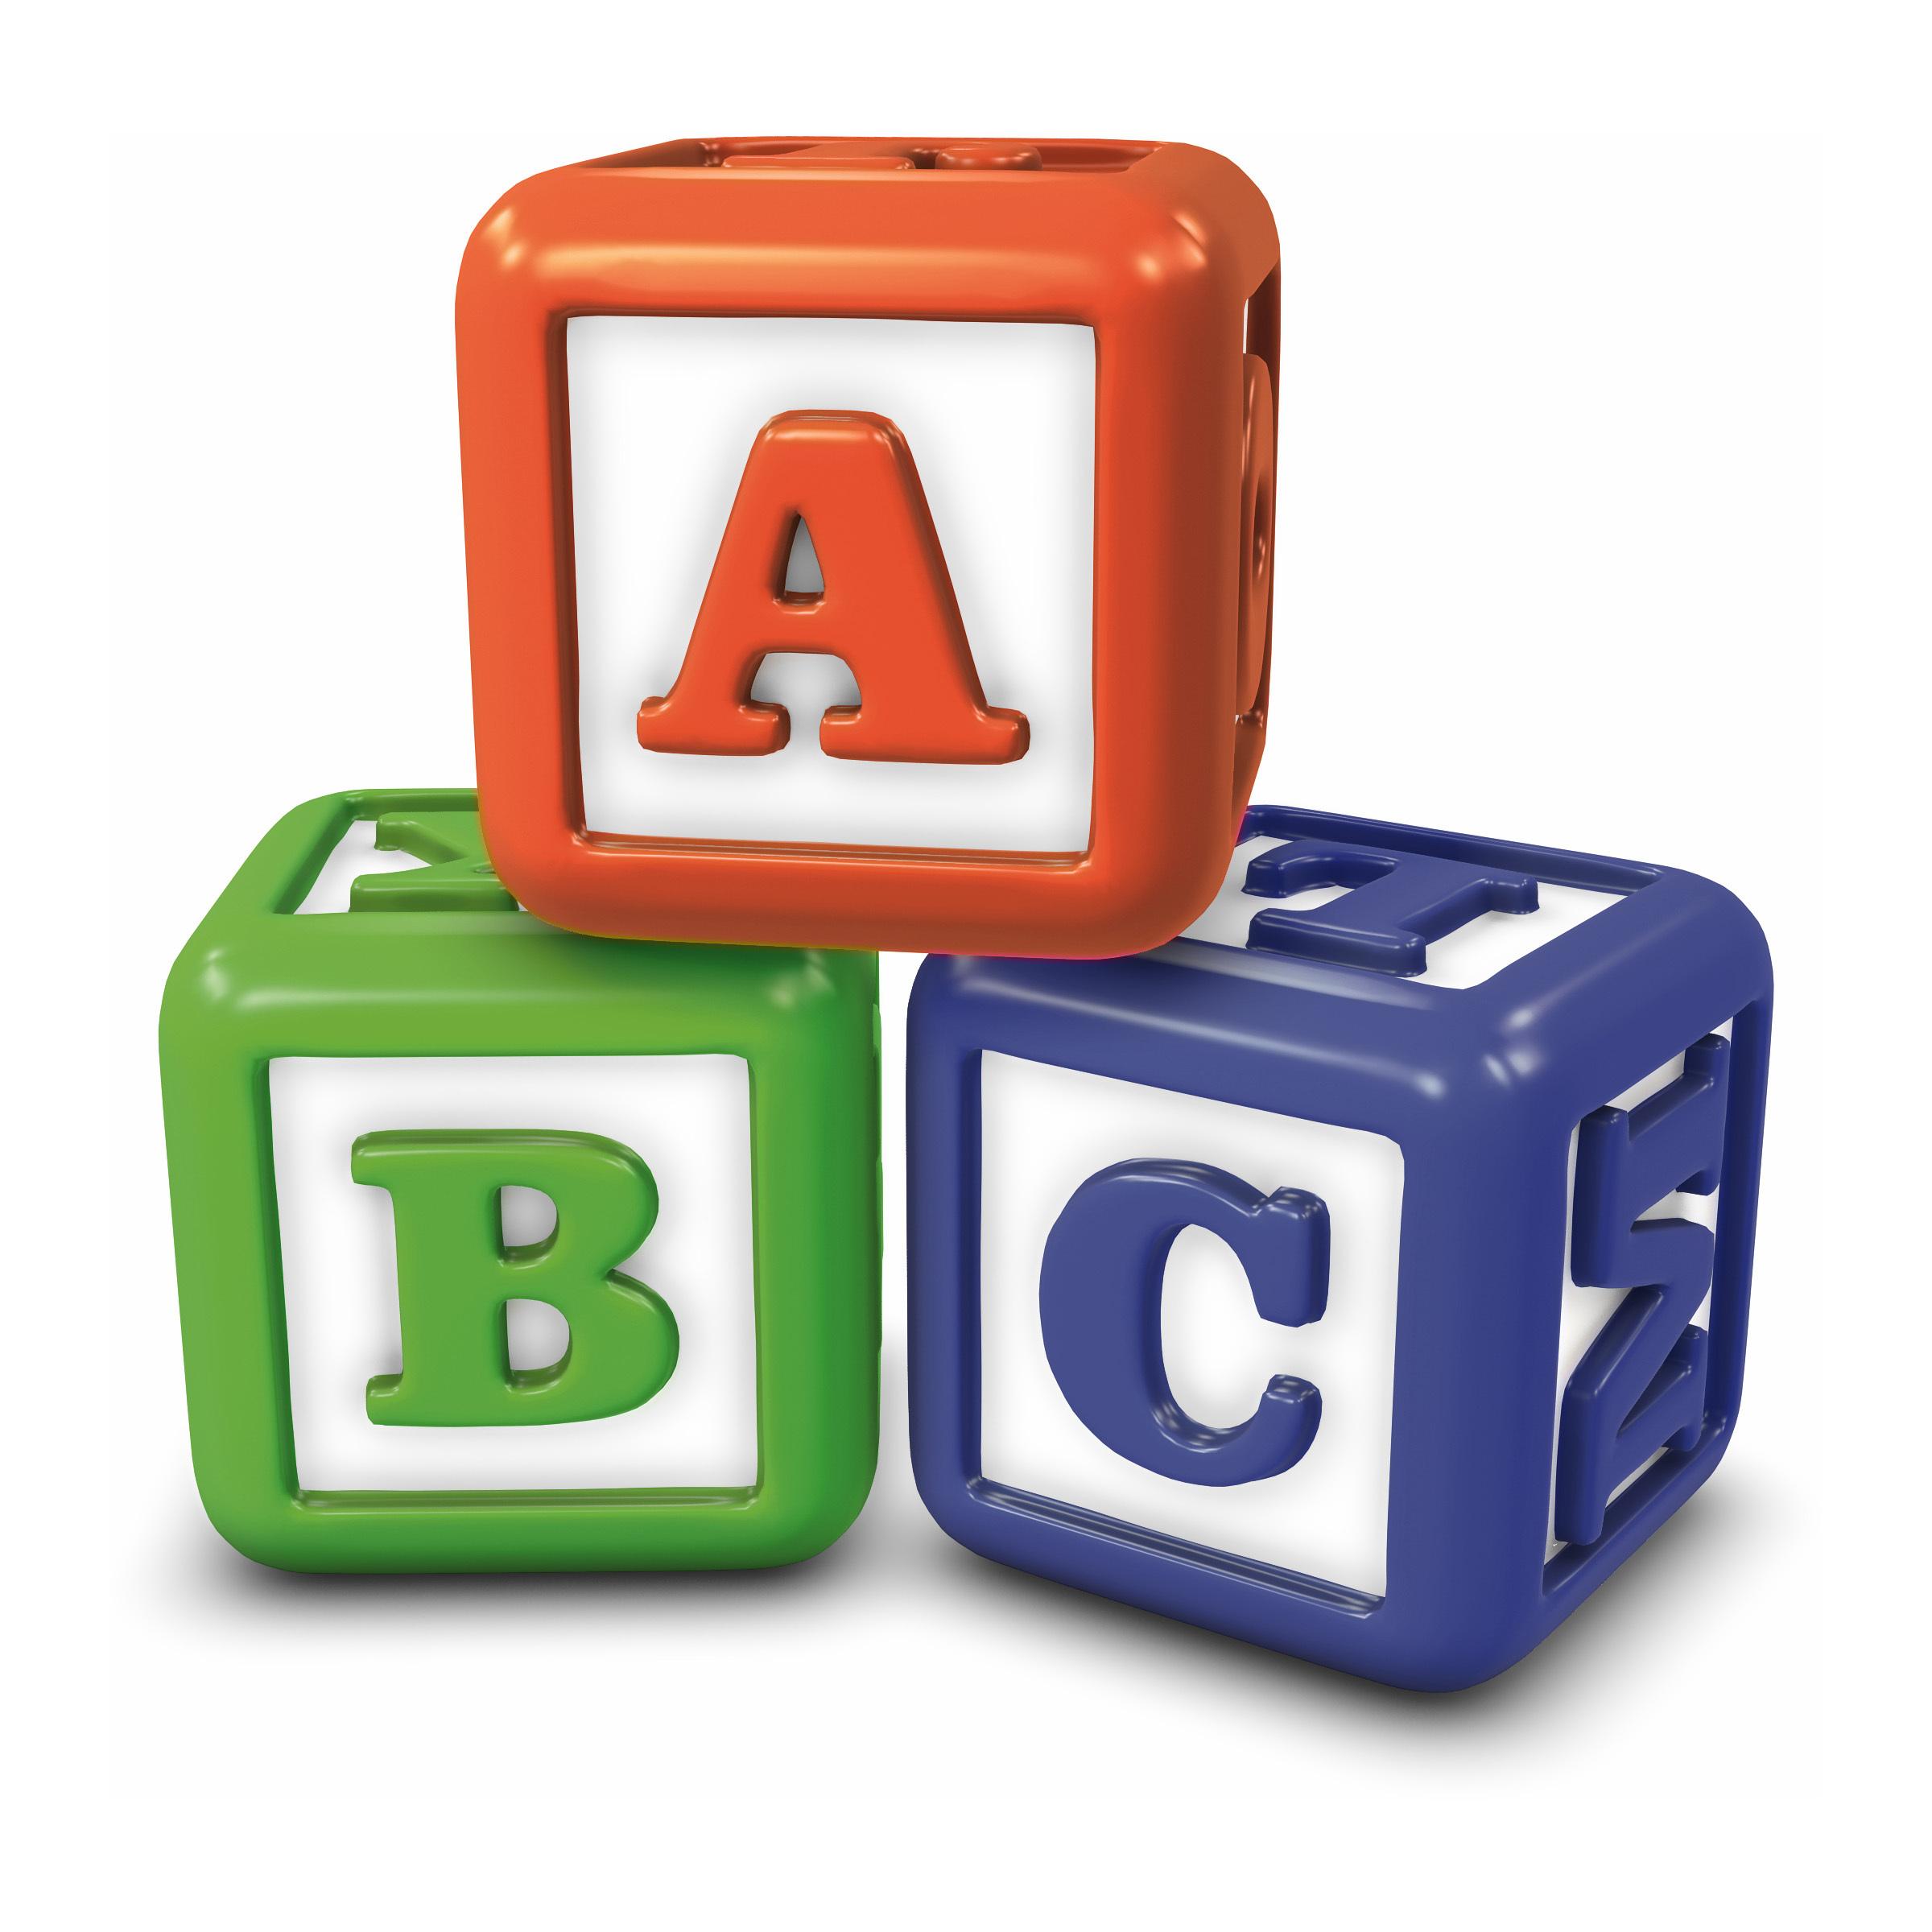 Abc blocks abc building blocks clipart clip art library.